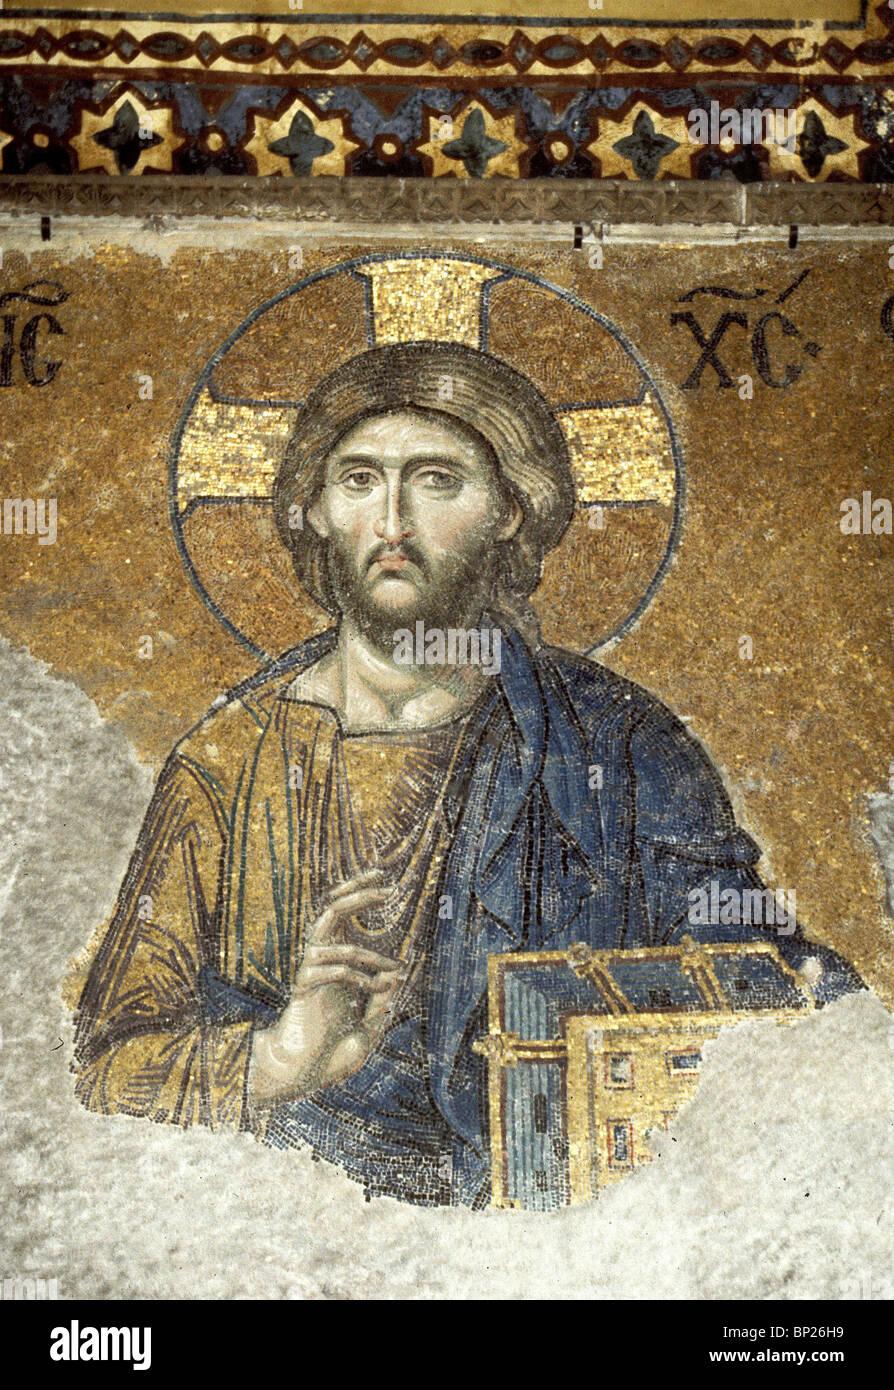 1094. JESUS CHRIST, 9TH. C. MOSAIC FROM HAGIA SOPHIA, ISTAMBUL - Stock Image